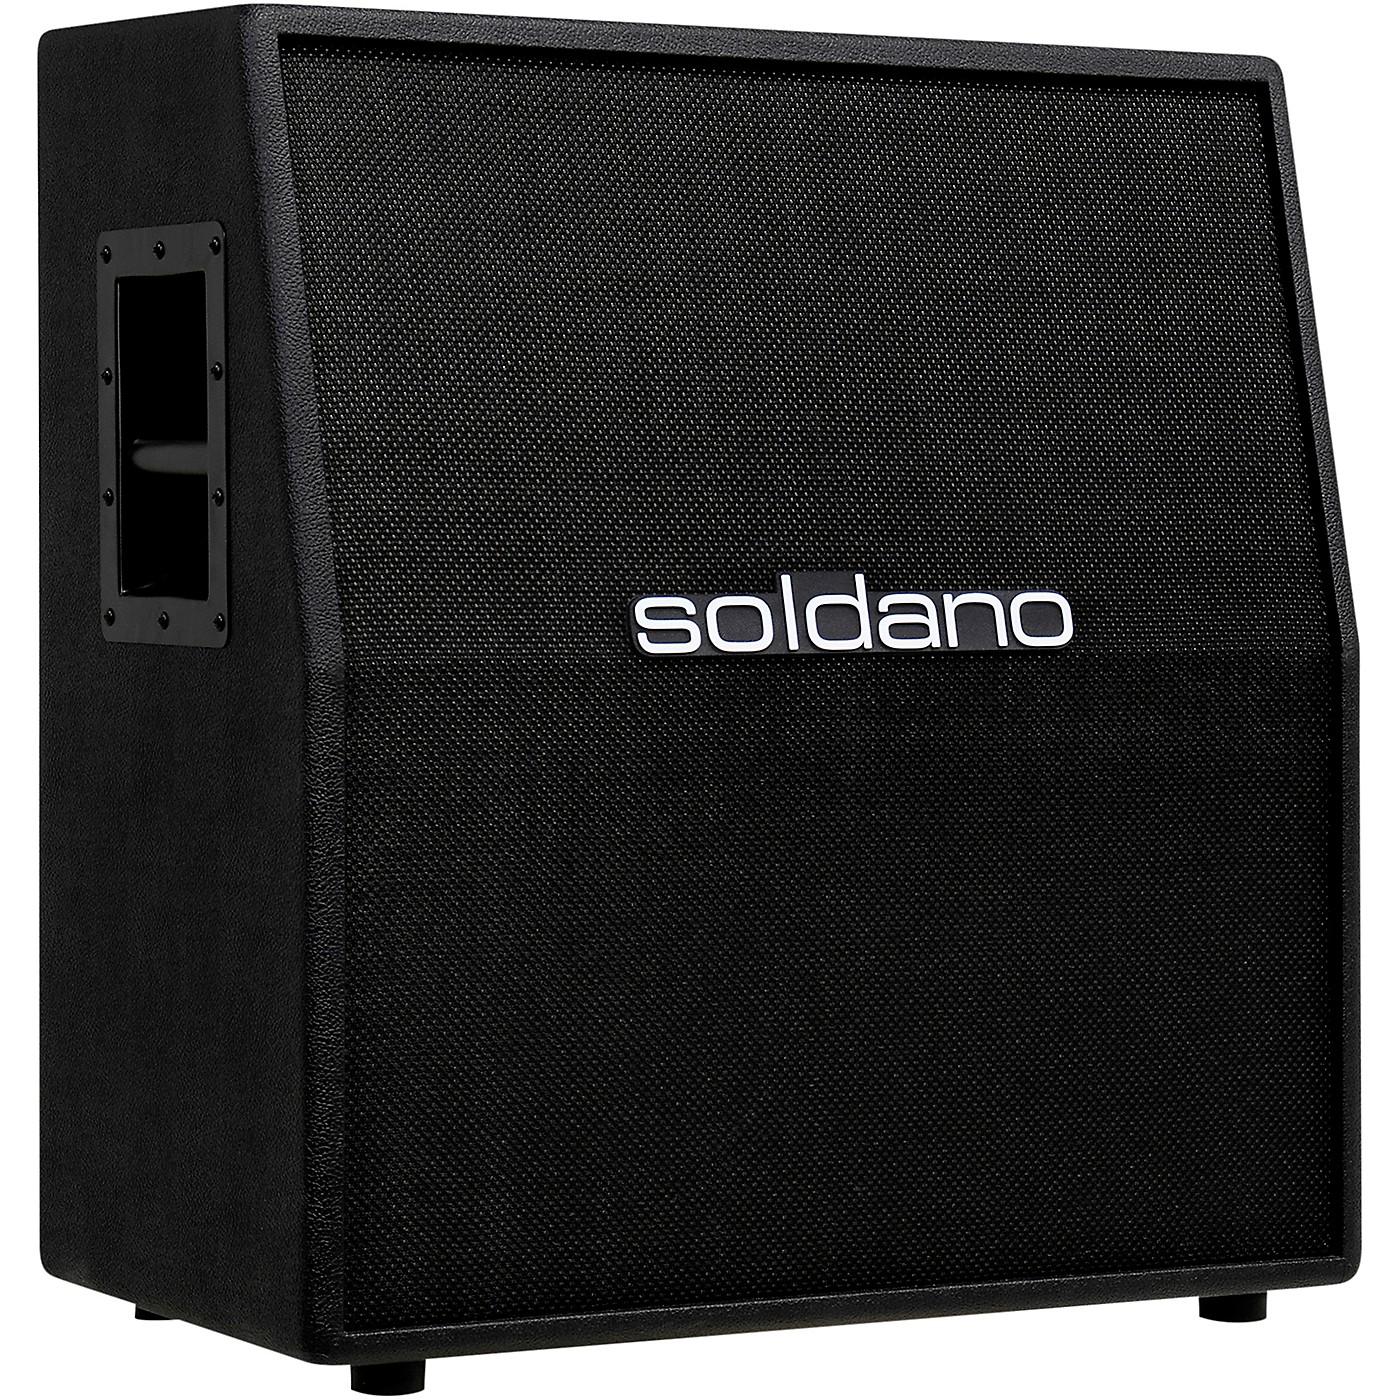 Soldano 2x12 Vintage 30 Cab thumbnail